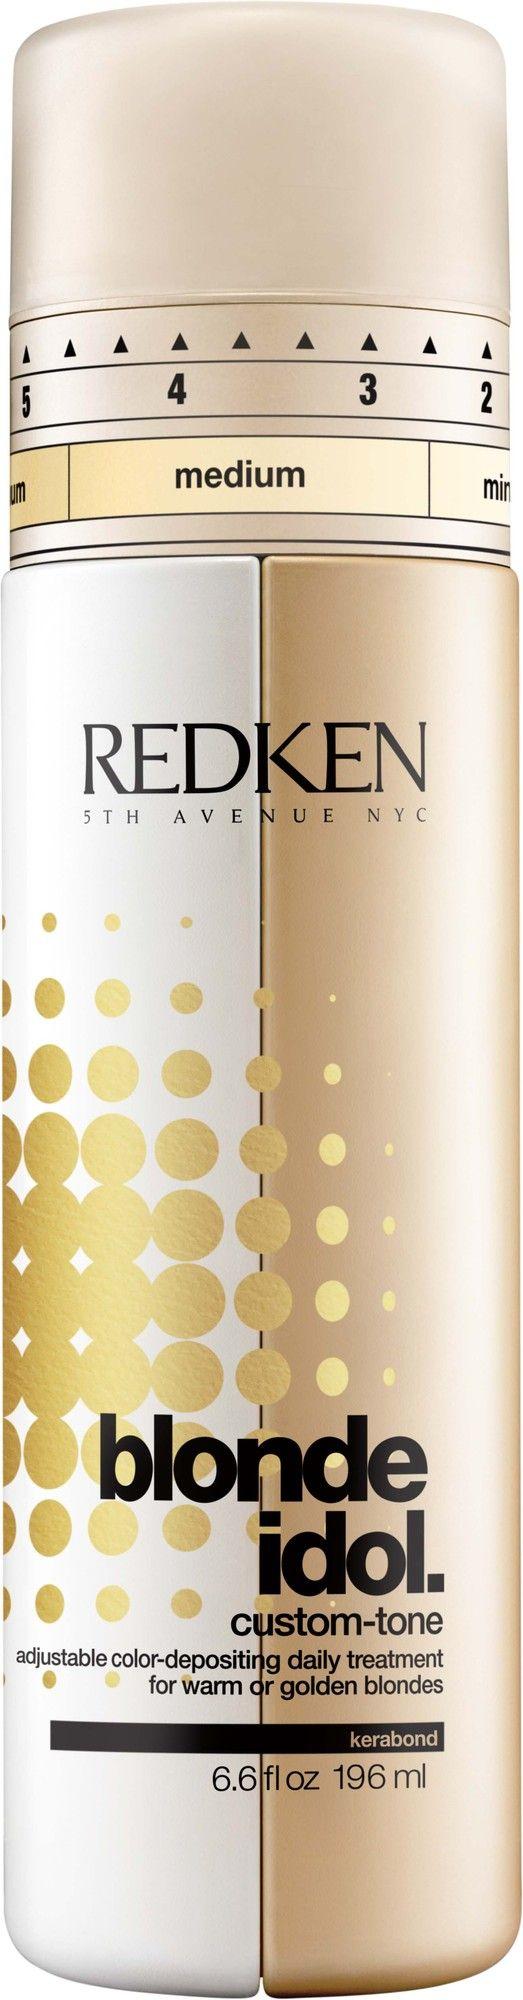 Redken Blonde Idol Treatment Gold 196ml  Description: Blonde Idol Treatment Gold  Price: 21.80  Meer informatie  #kapper #haircutter #hair #kapperskorting